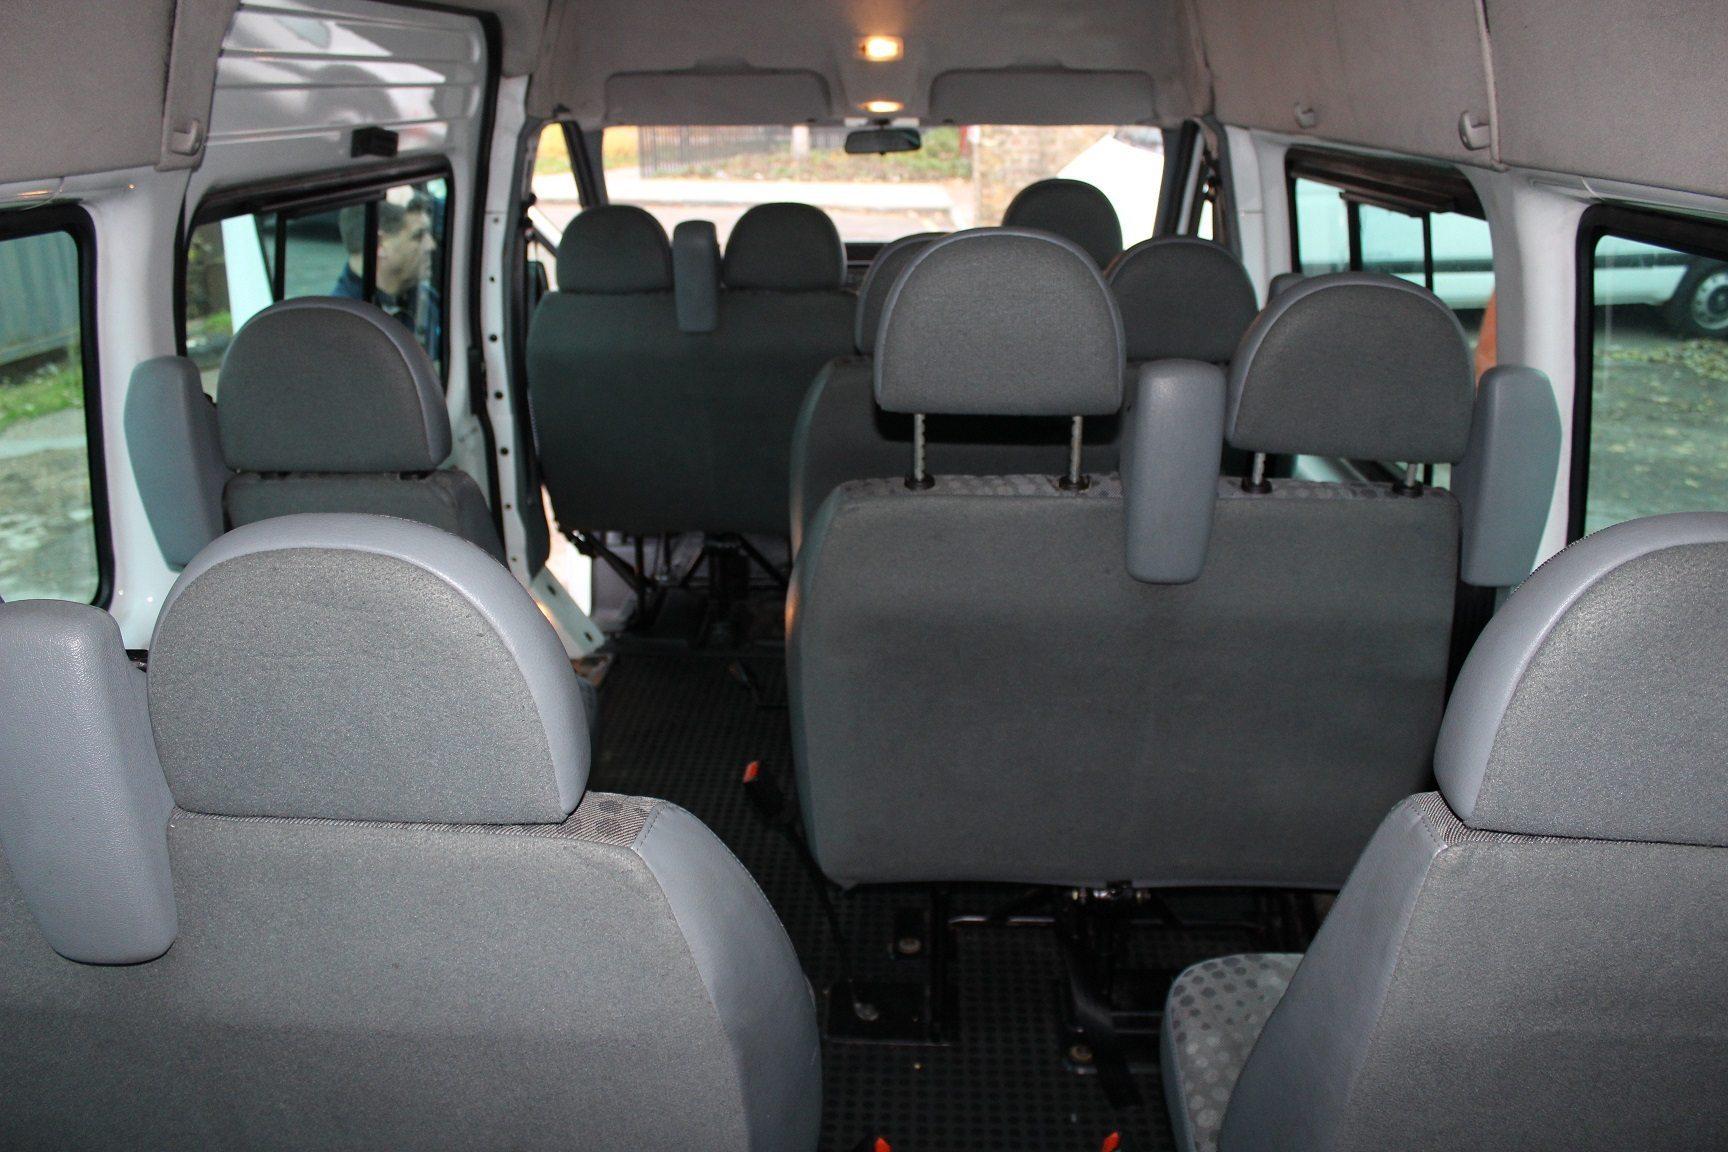 2007 ford transit 16 seats hills coaches. Black Bedroom Furniture Sets. Home Design Ideas